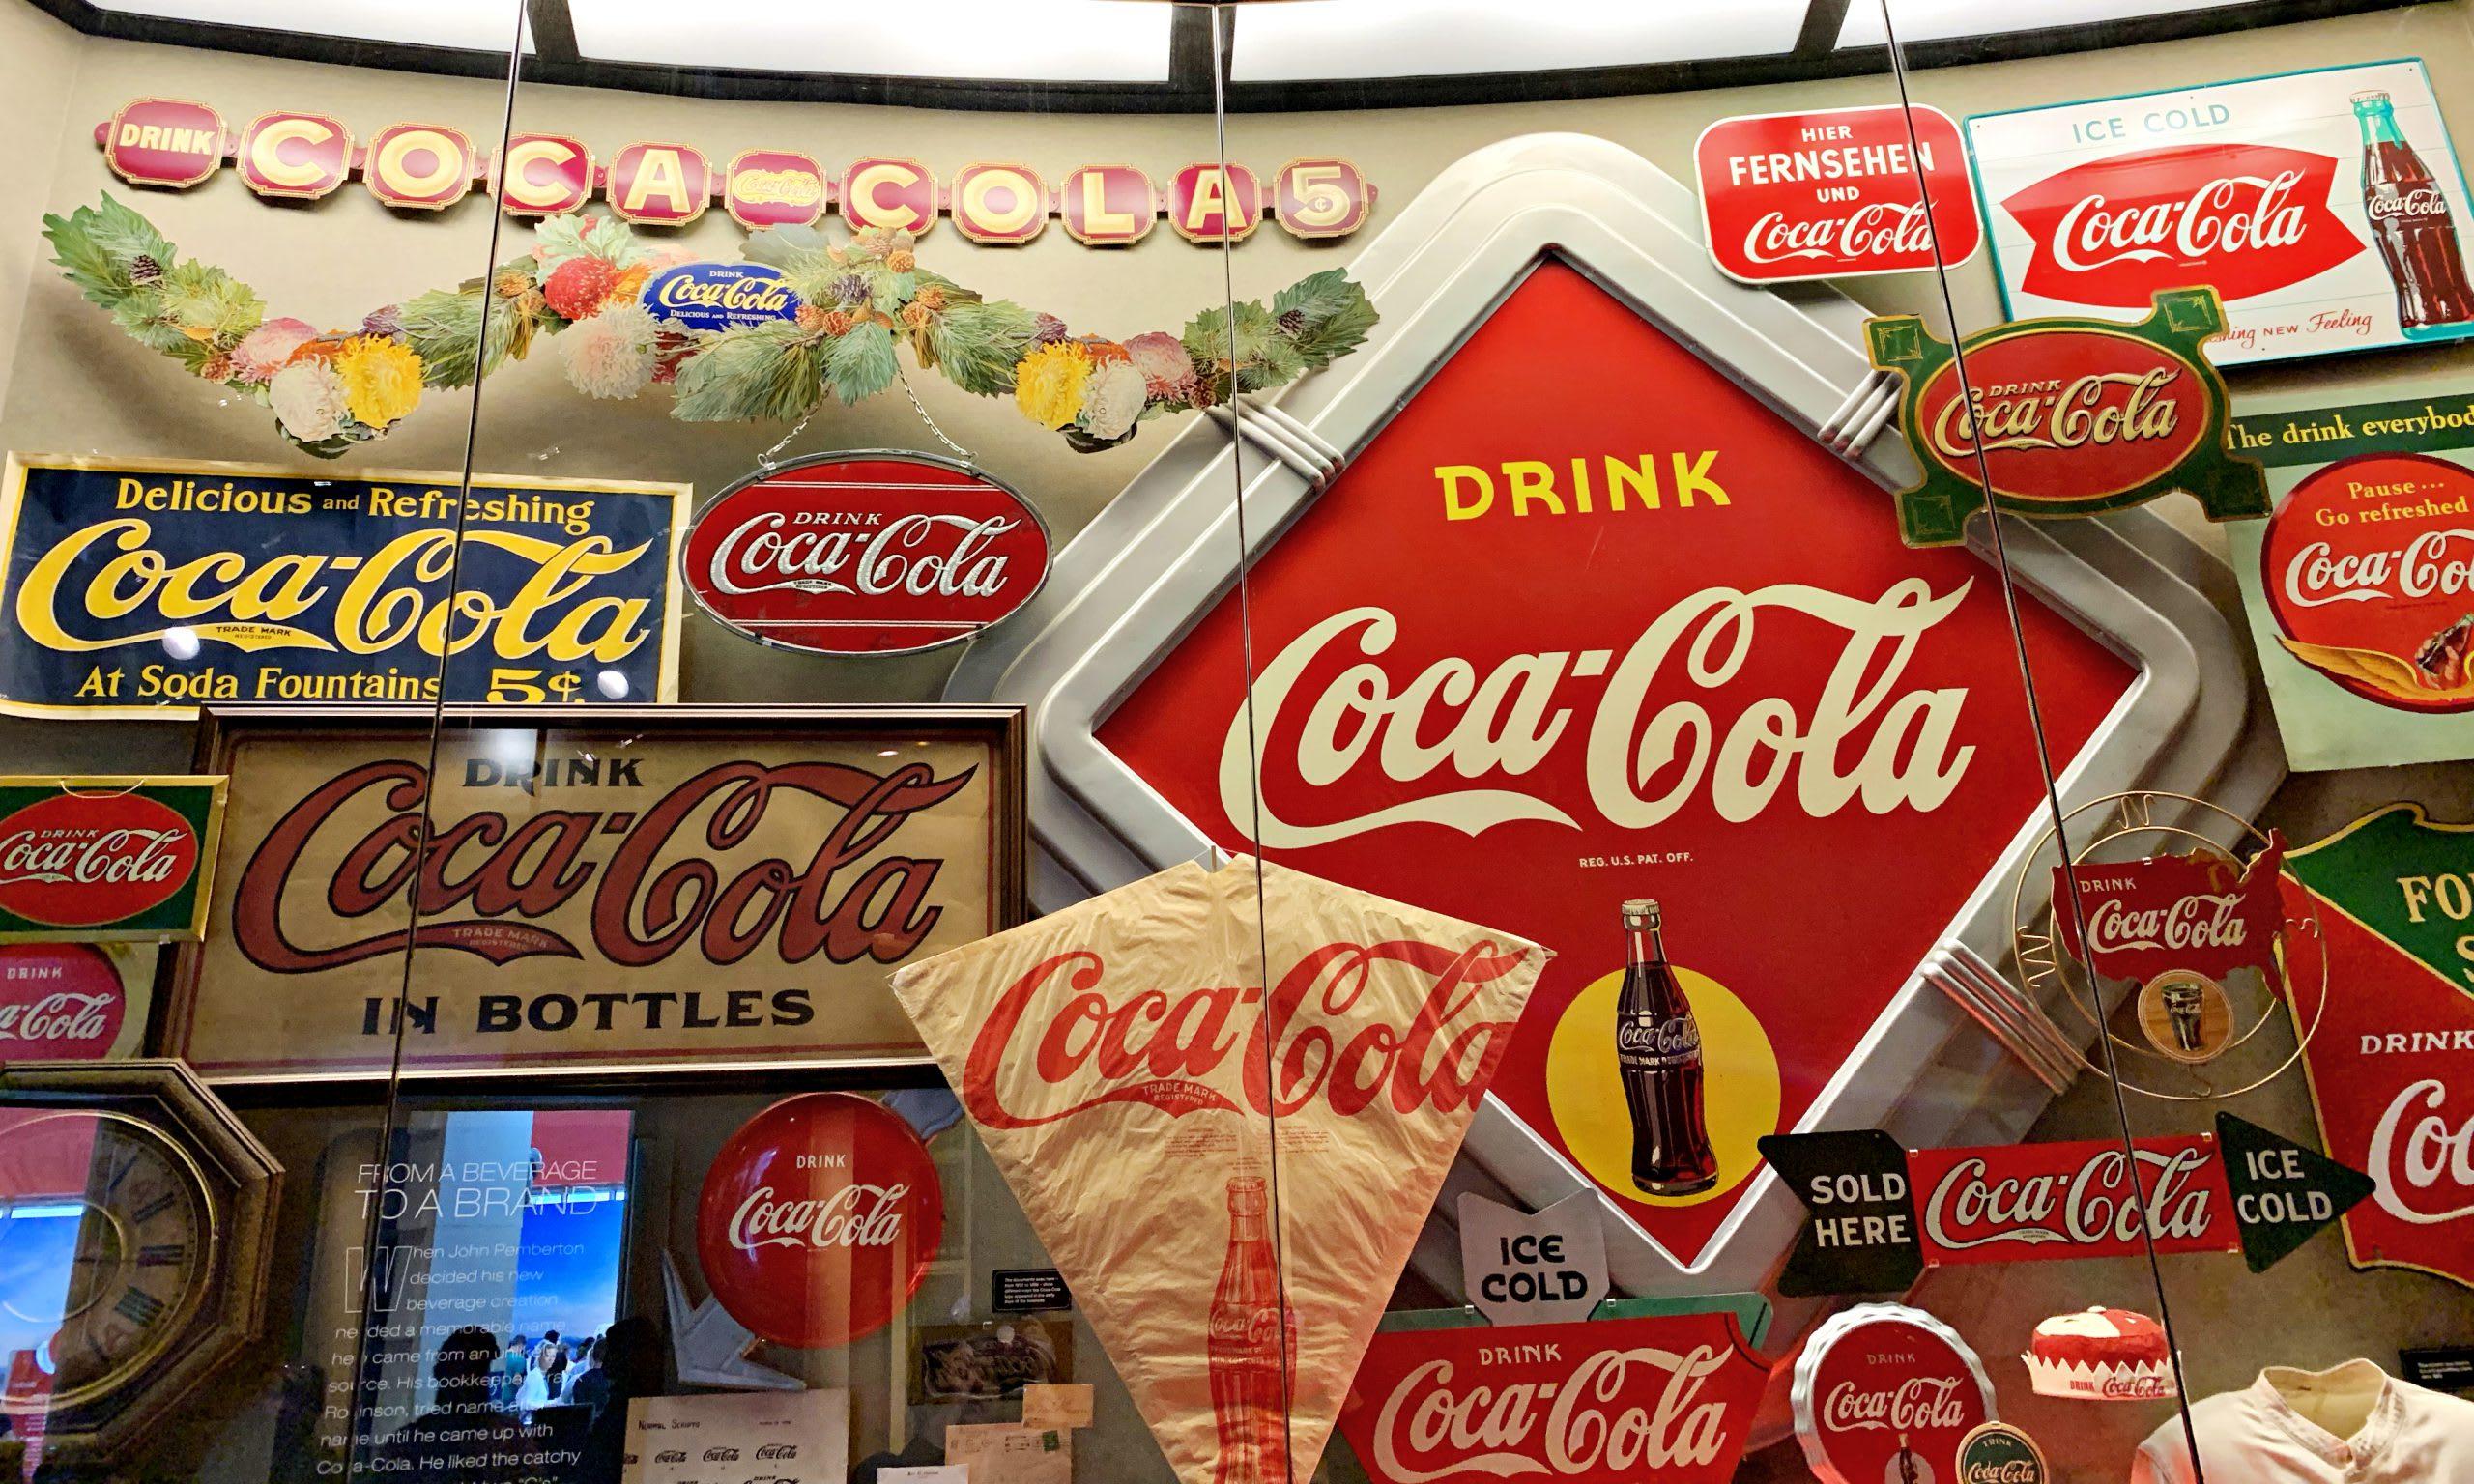 World of Coca Cola_Atlanta Georgia Things to Do_City Guide_Love Joleen_02.jpg